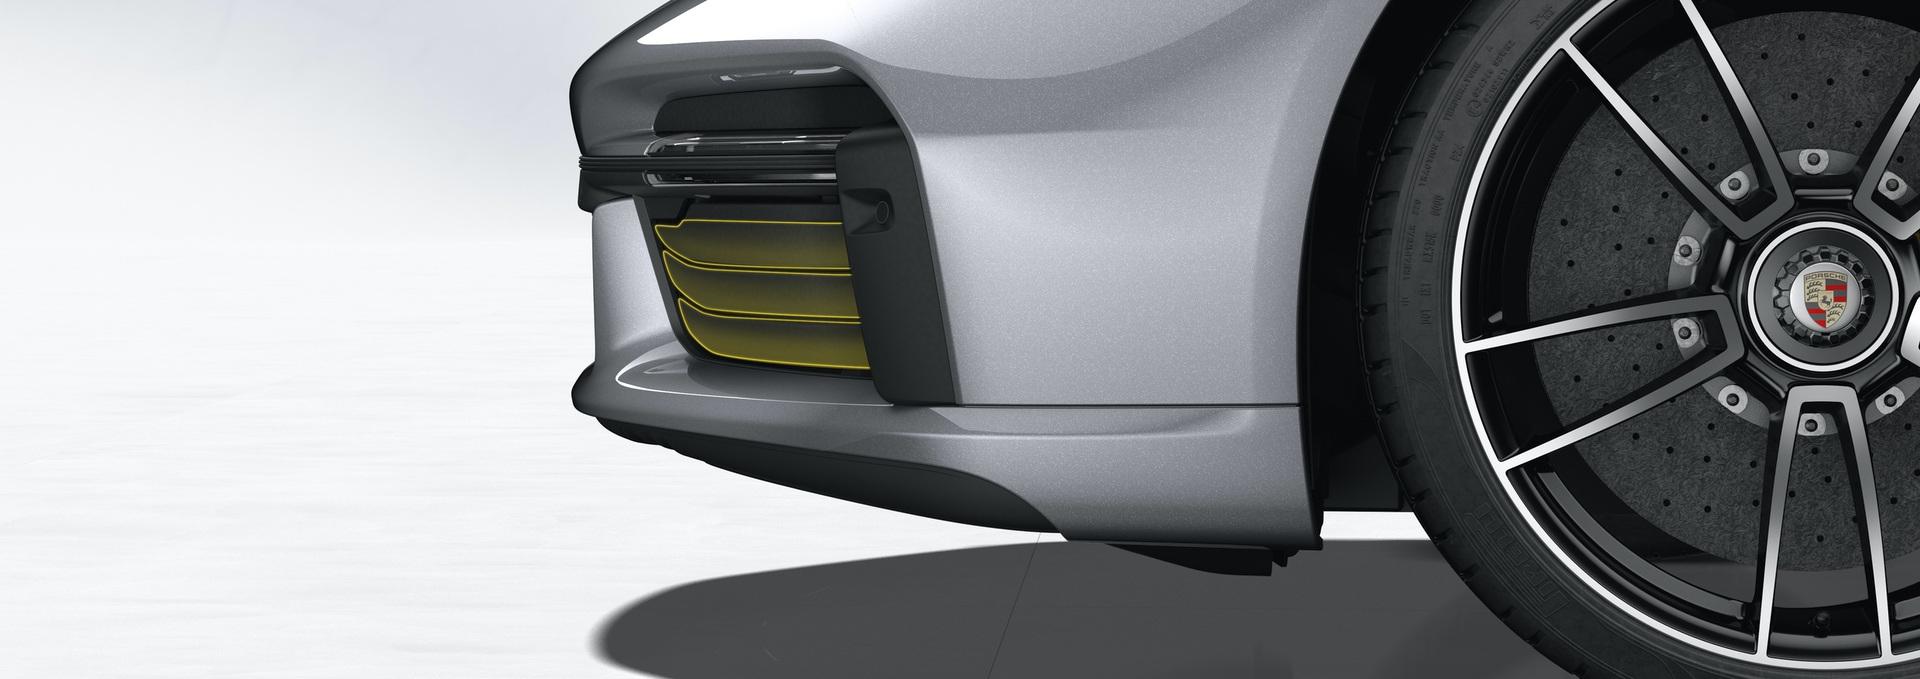 2020_Porsche_911-Turbo_S-aerodynamics_0003